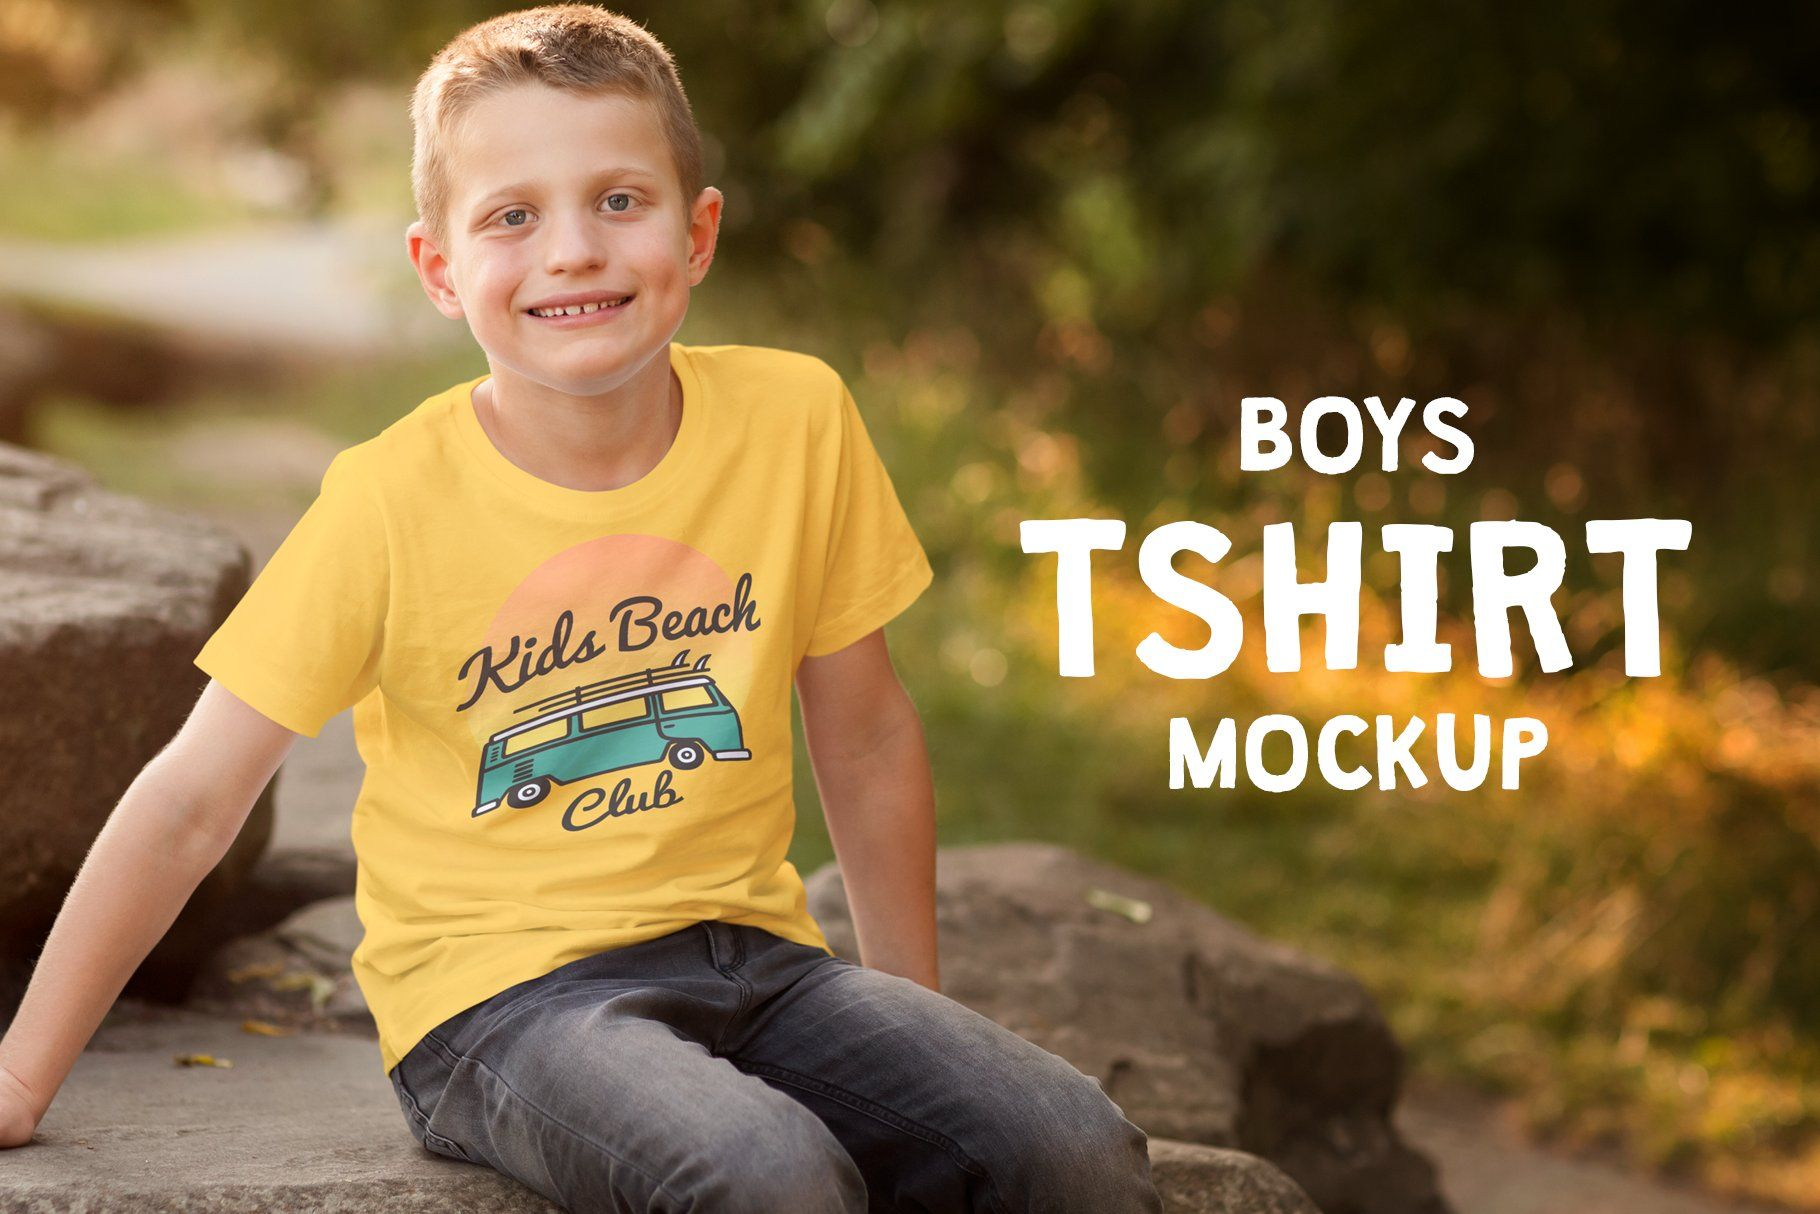 Download Boys T Shirt Mock Up Psd Mockup Template Design Mockup Free Free Psd Design